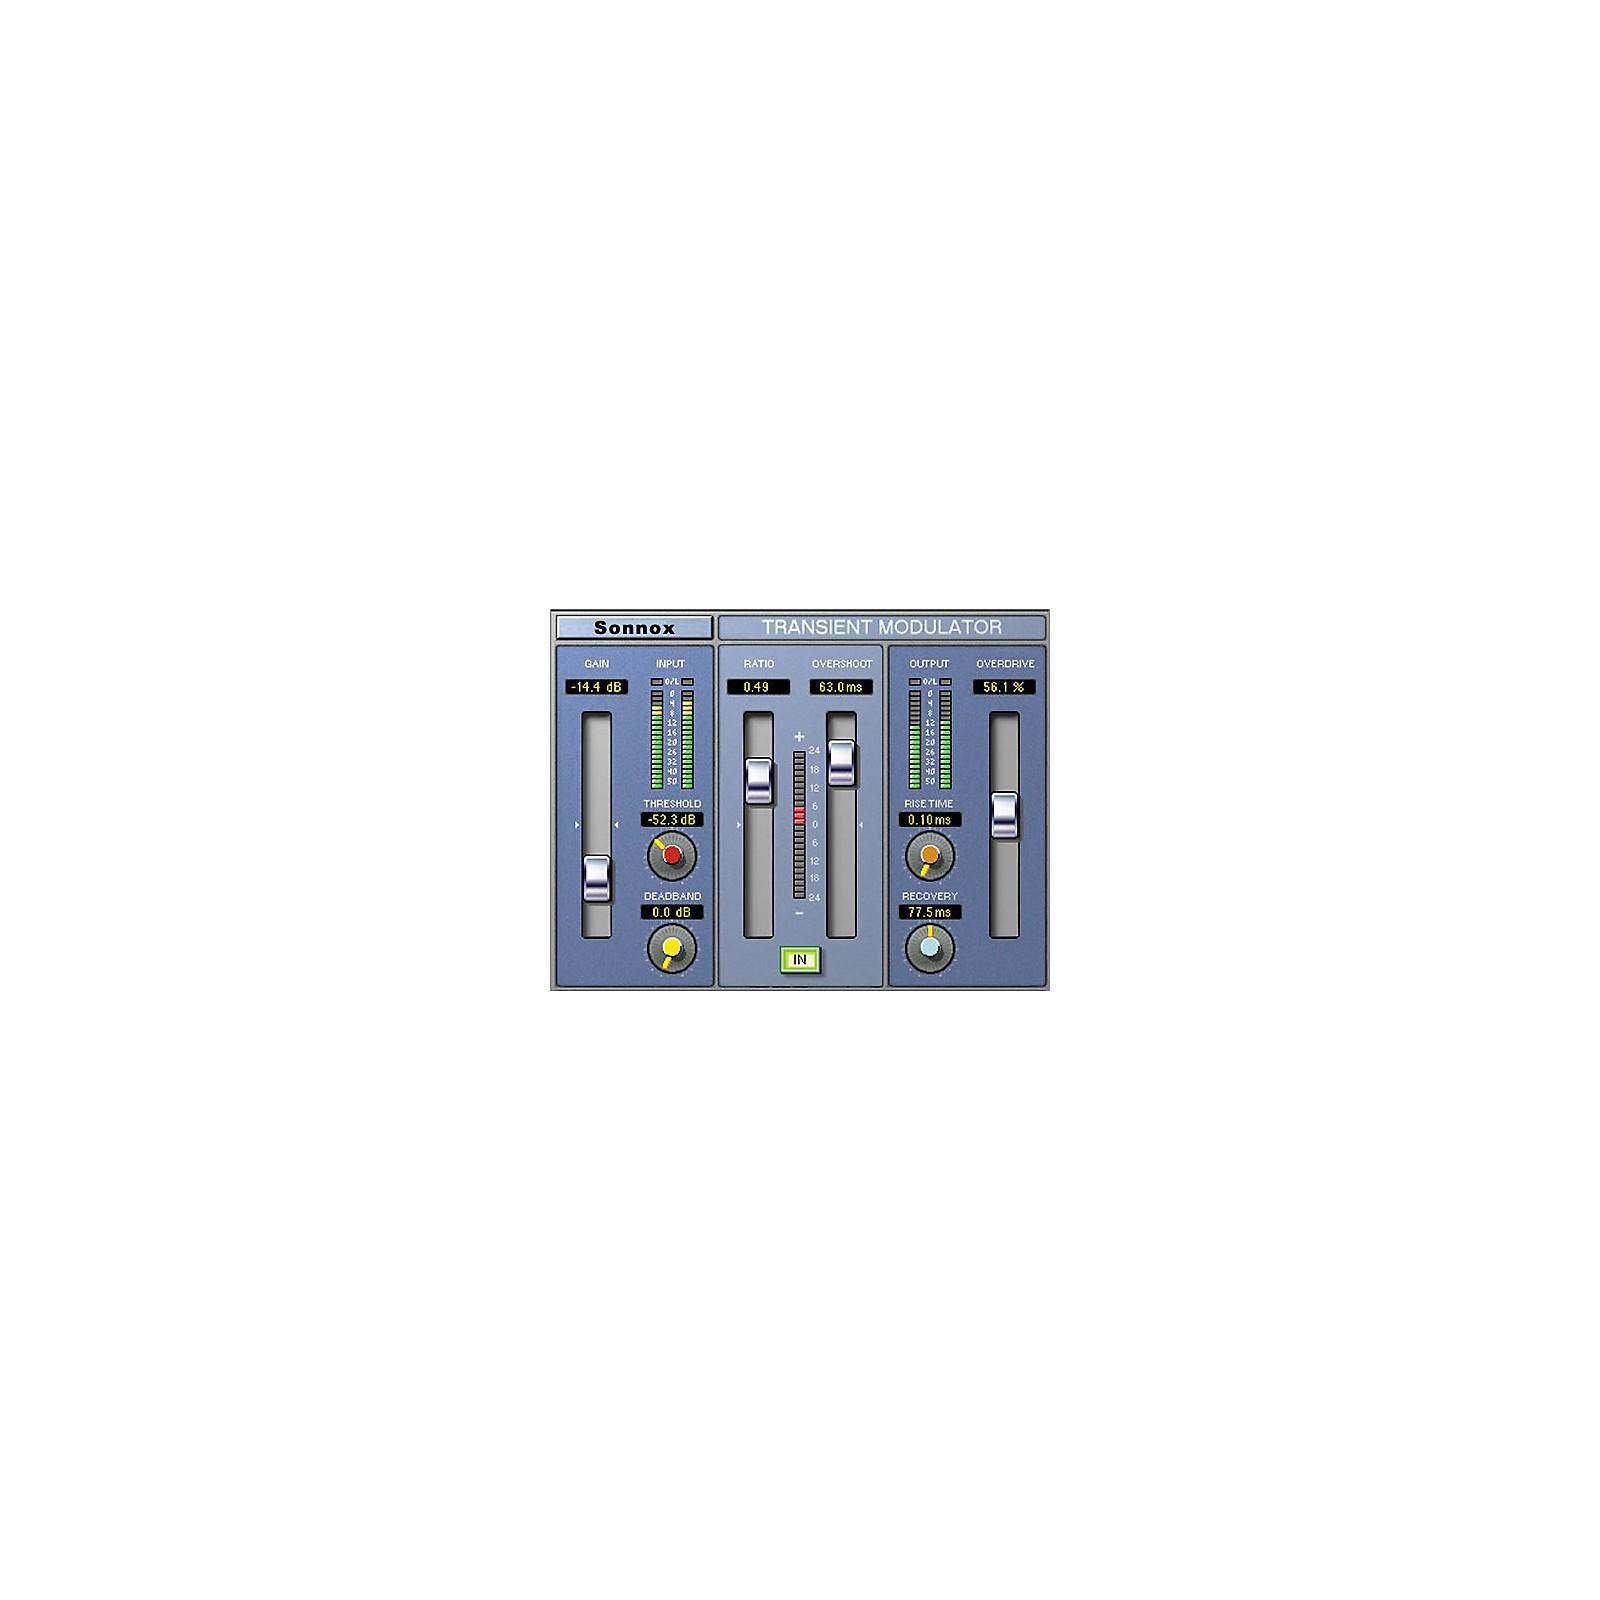 Sonnox Oxford TransMod (HD-HDX) Software Download